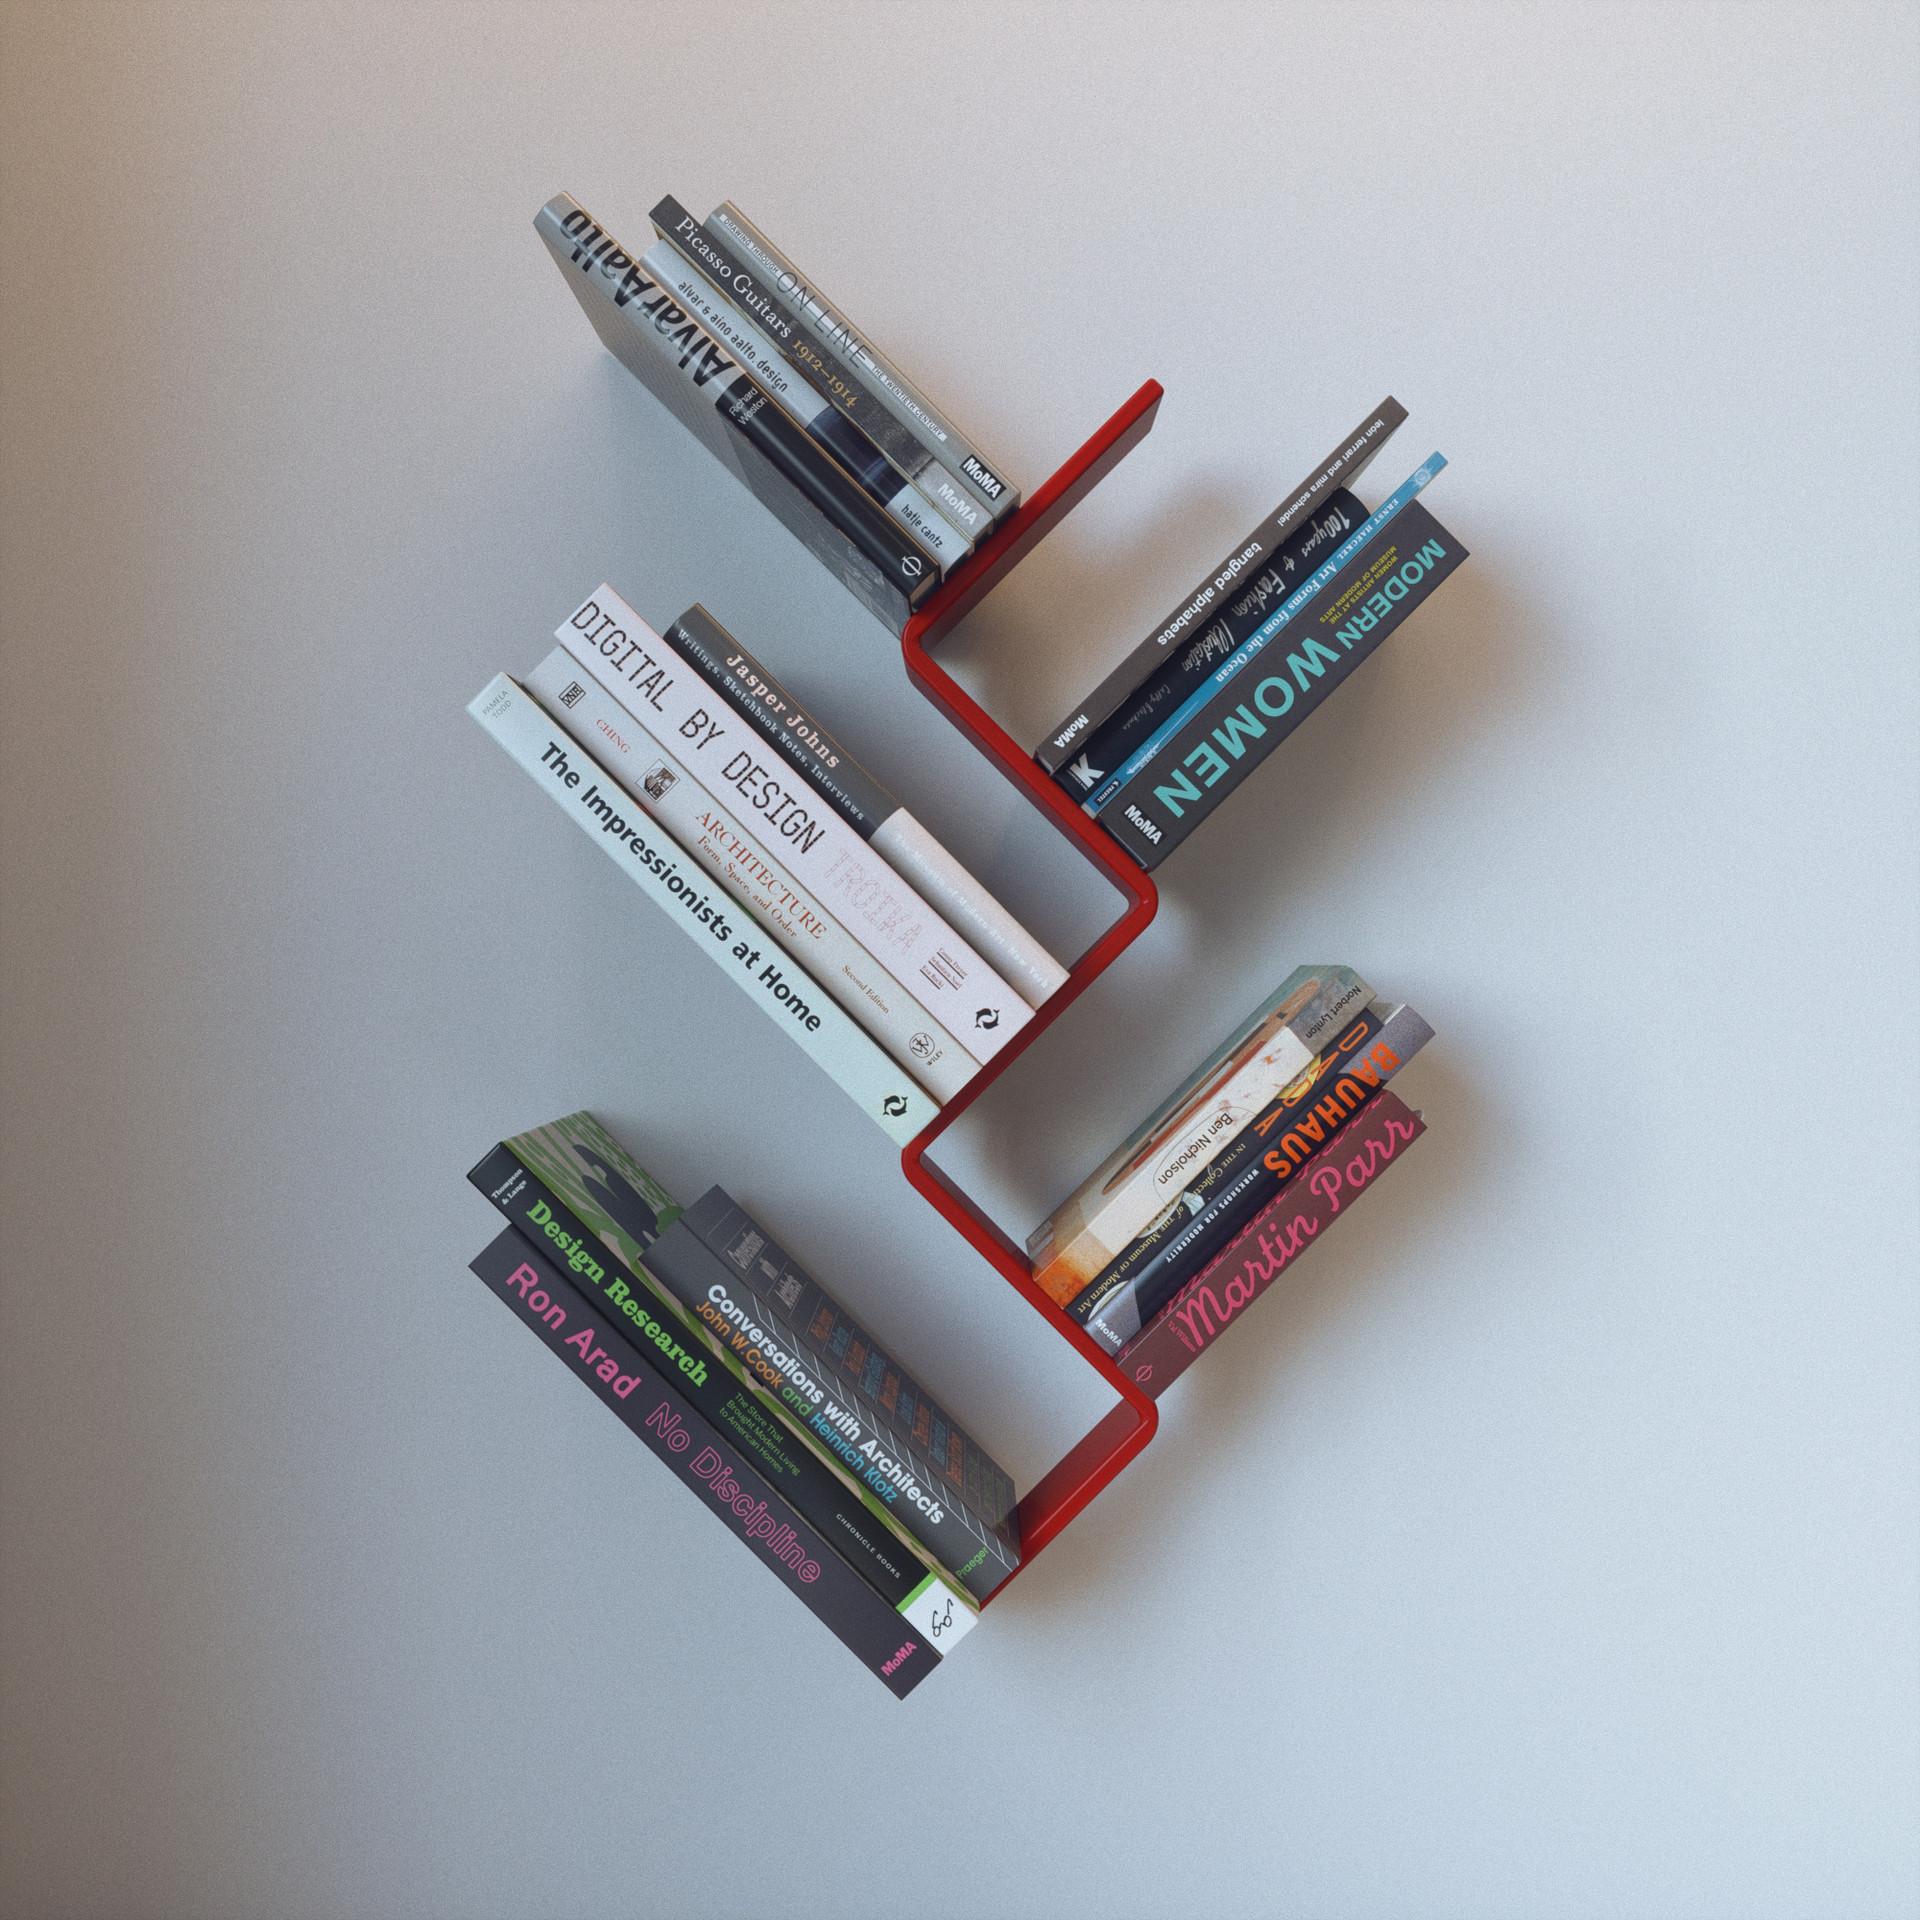 Z bookcase FAKTURA Miron Lior